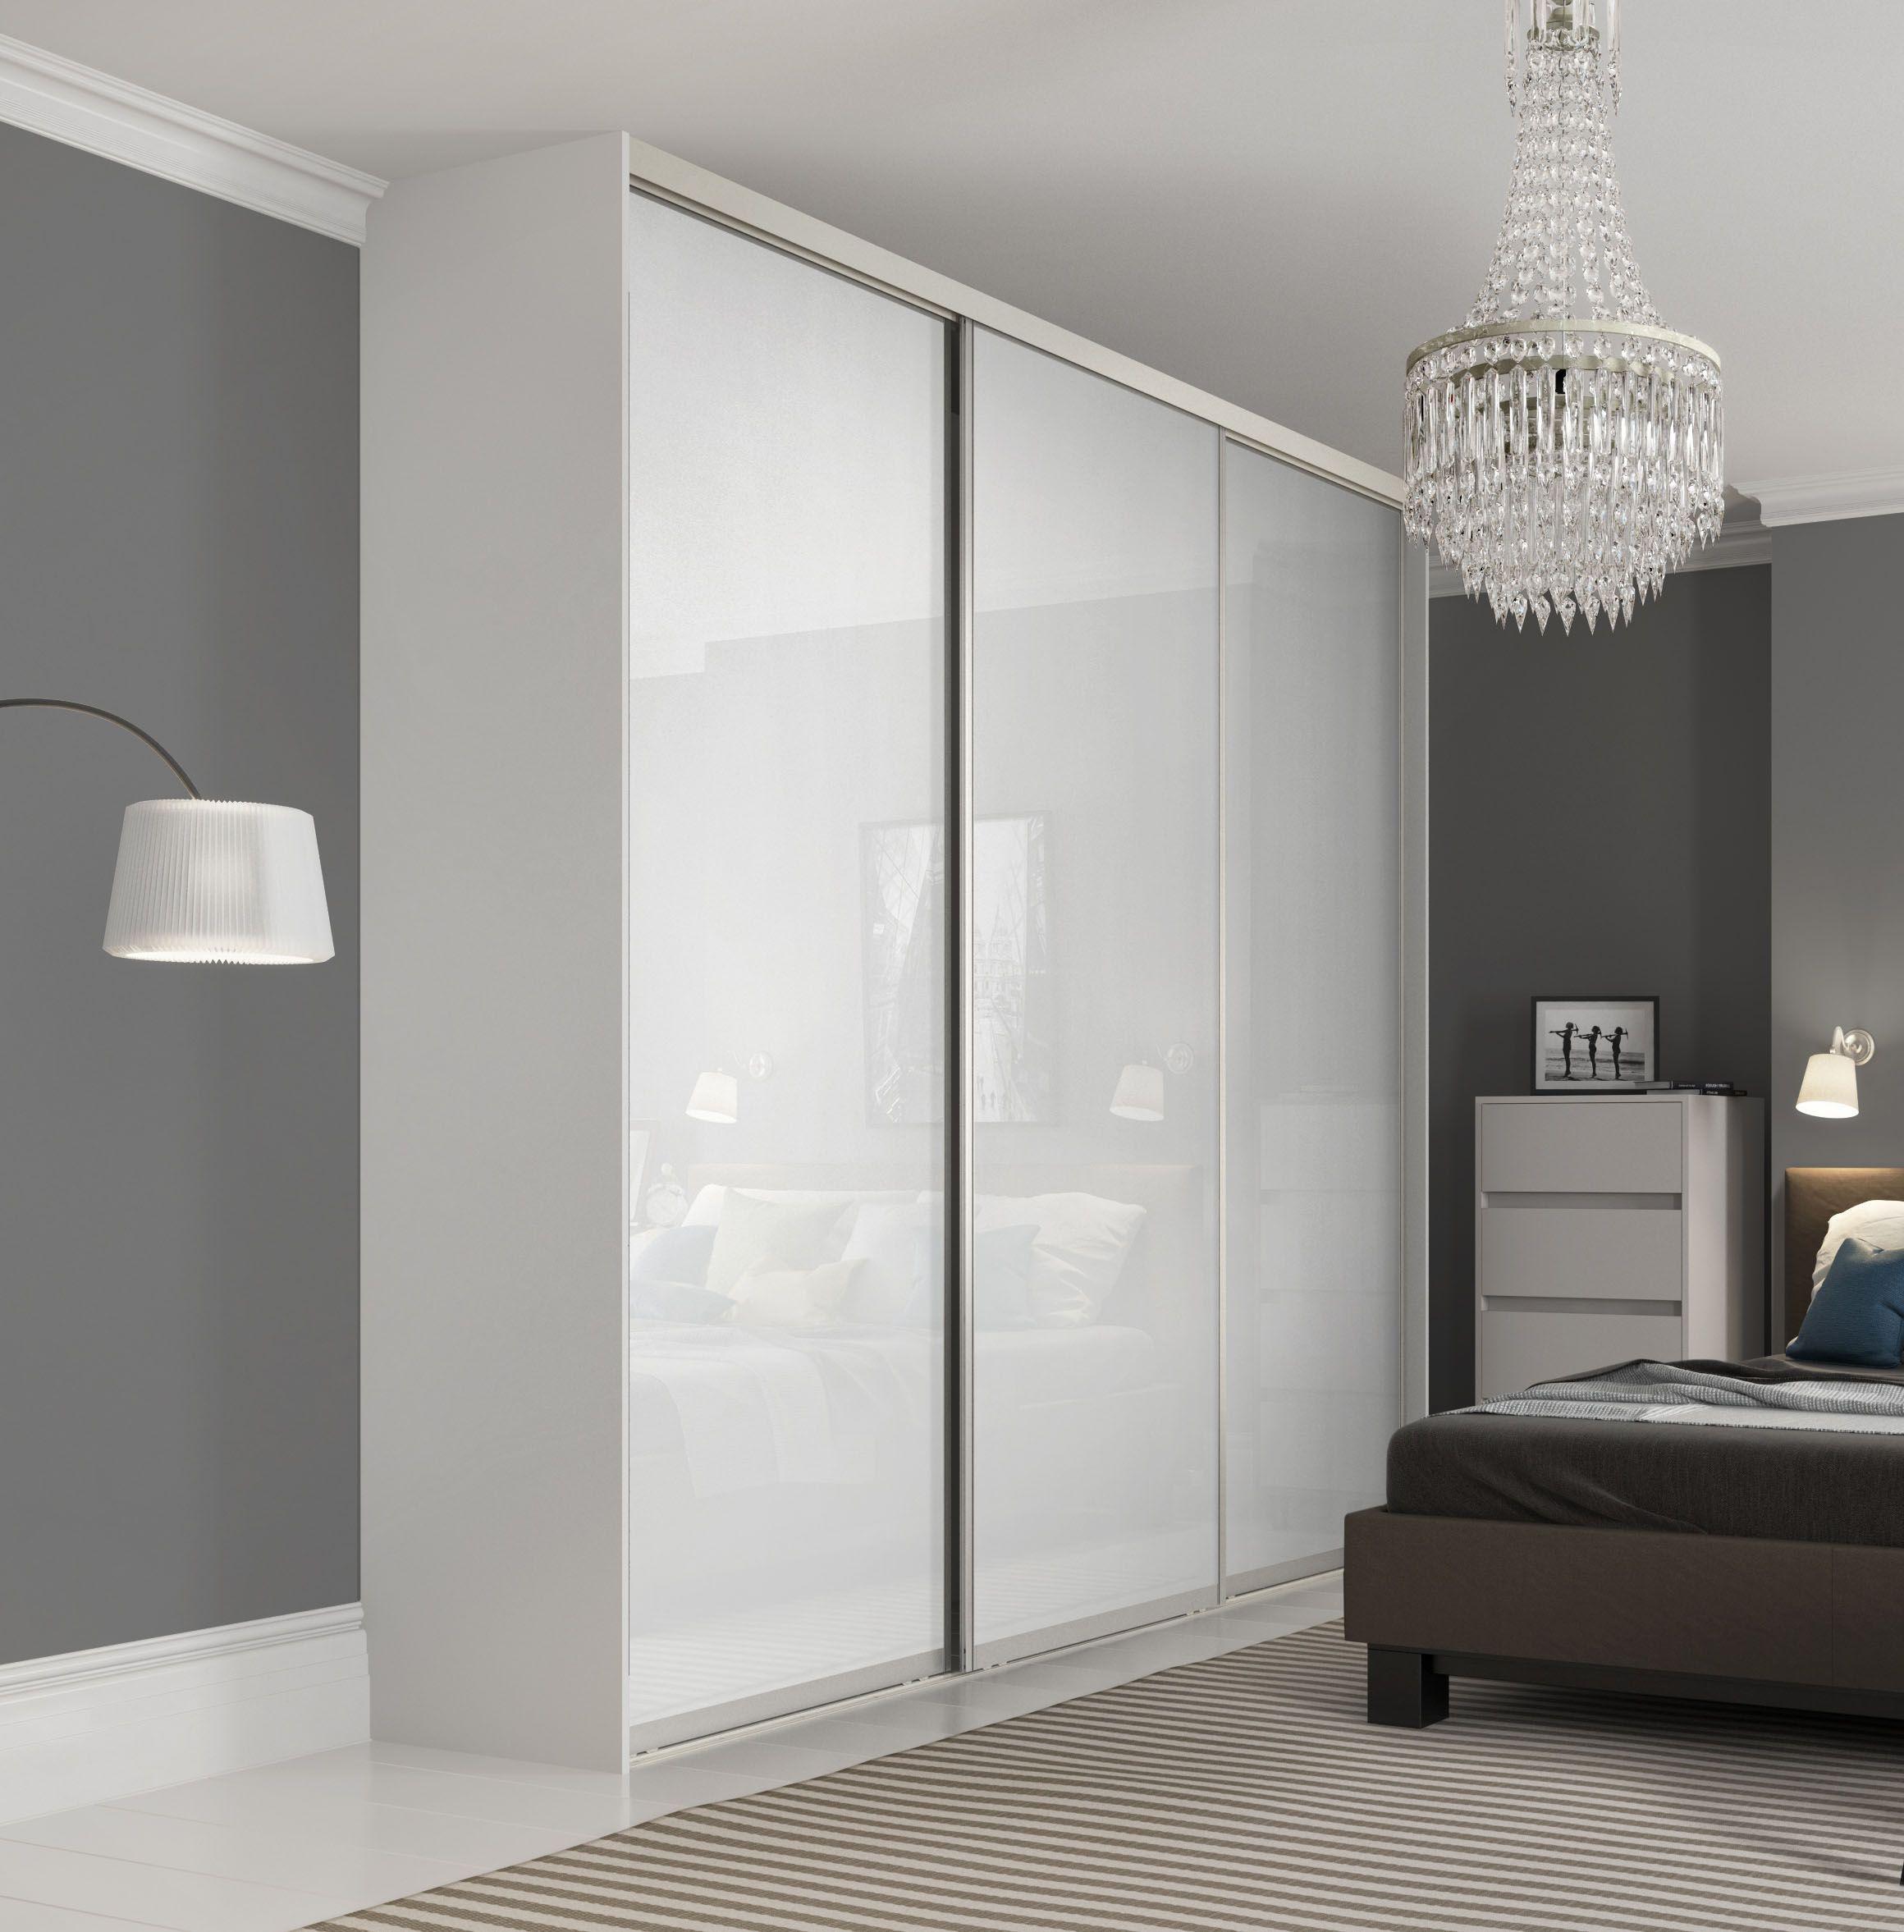 Premium Midi Single Panel Sliding Wardrobe Doors In Pure White Glass With Satin Silver Frame Wardrobe Doors Sliding Wardrobe Doors Glass Wardrobe